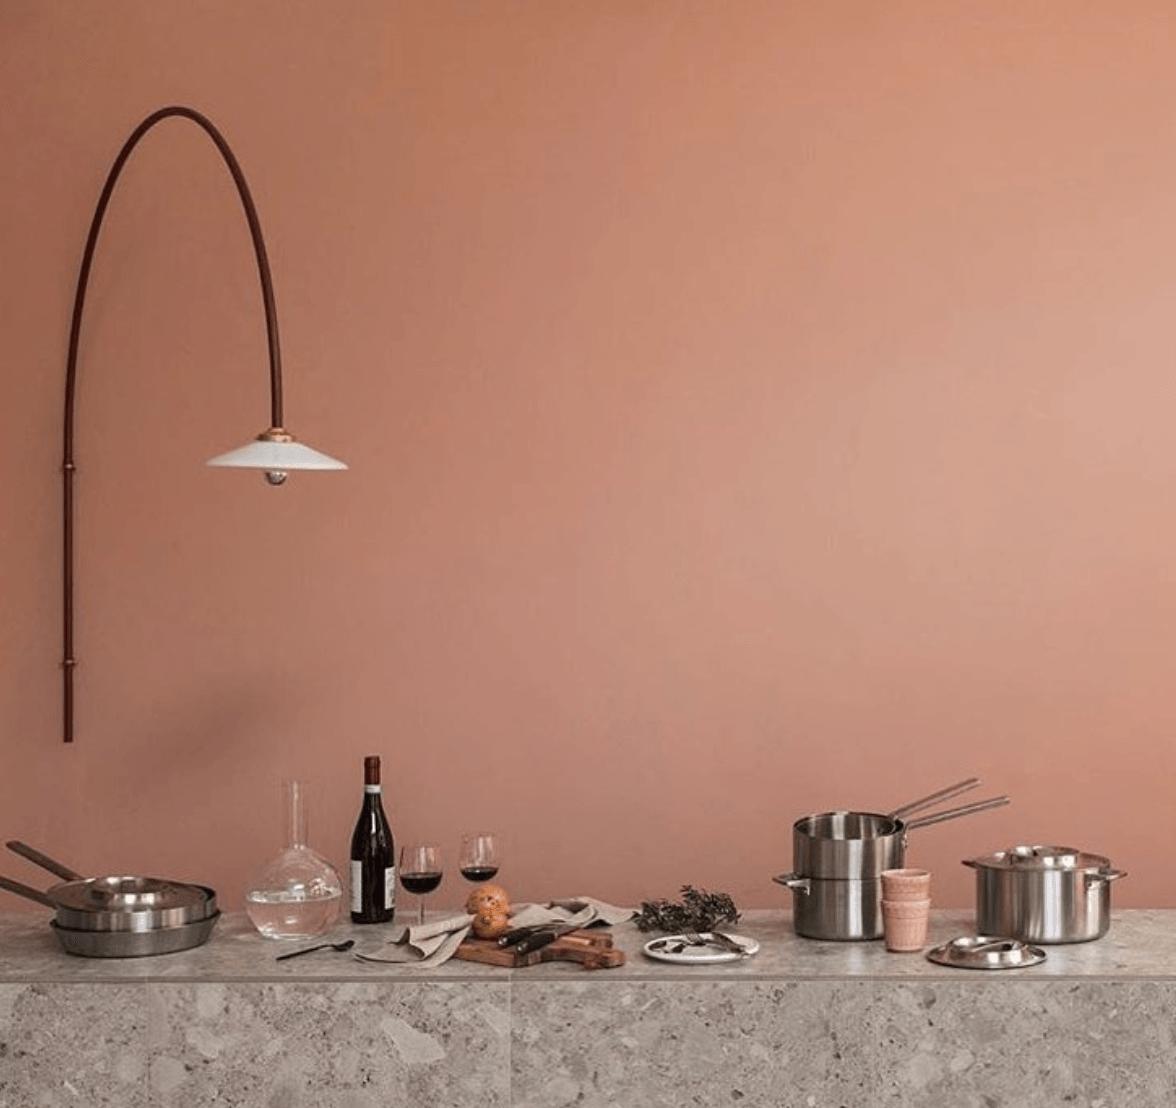 interieur-interior-keuken-kitchen-pink-roze-natuursteen-natural stone-muller van severen